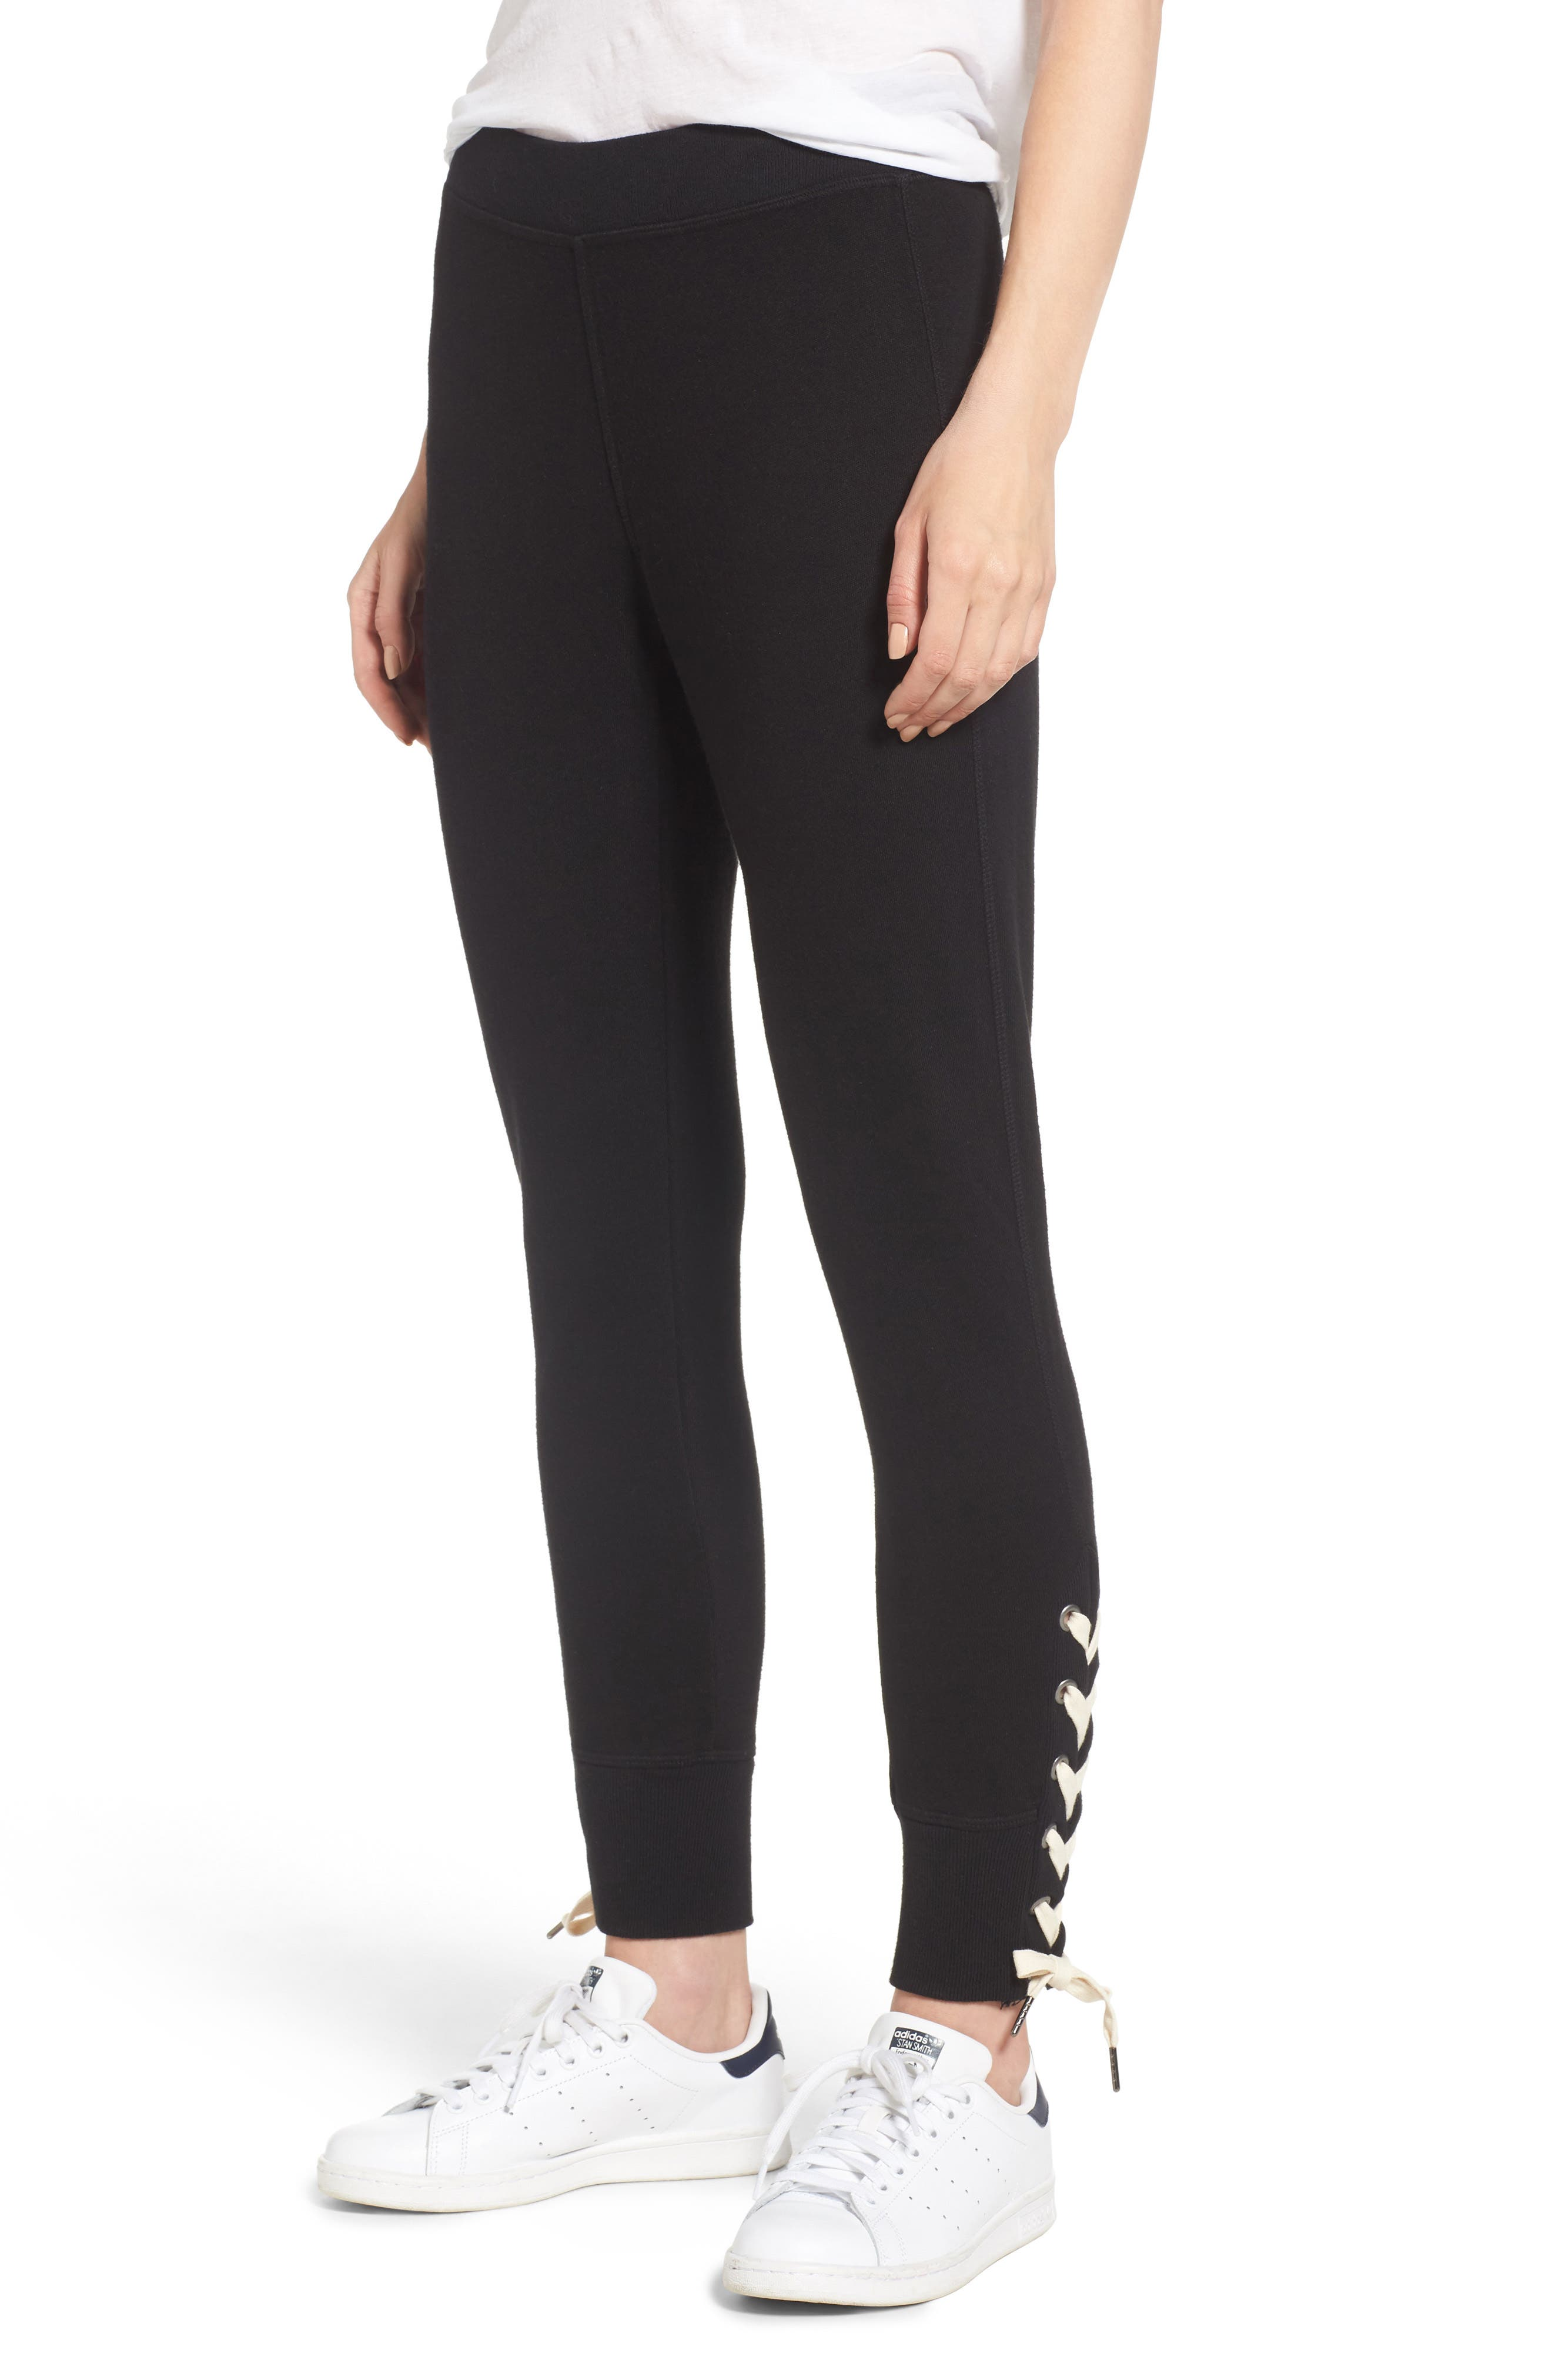 Alternate Image 1 Selected - n:PHILANTHROPY Marta Lace-Up Jogger Pants